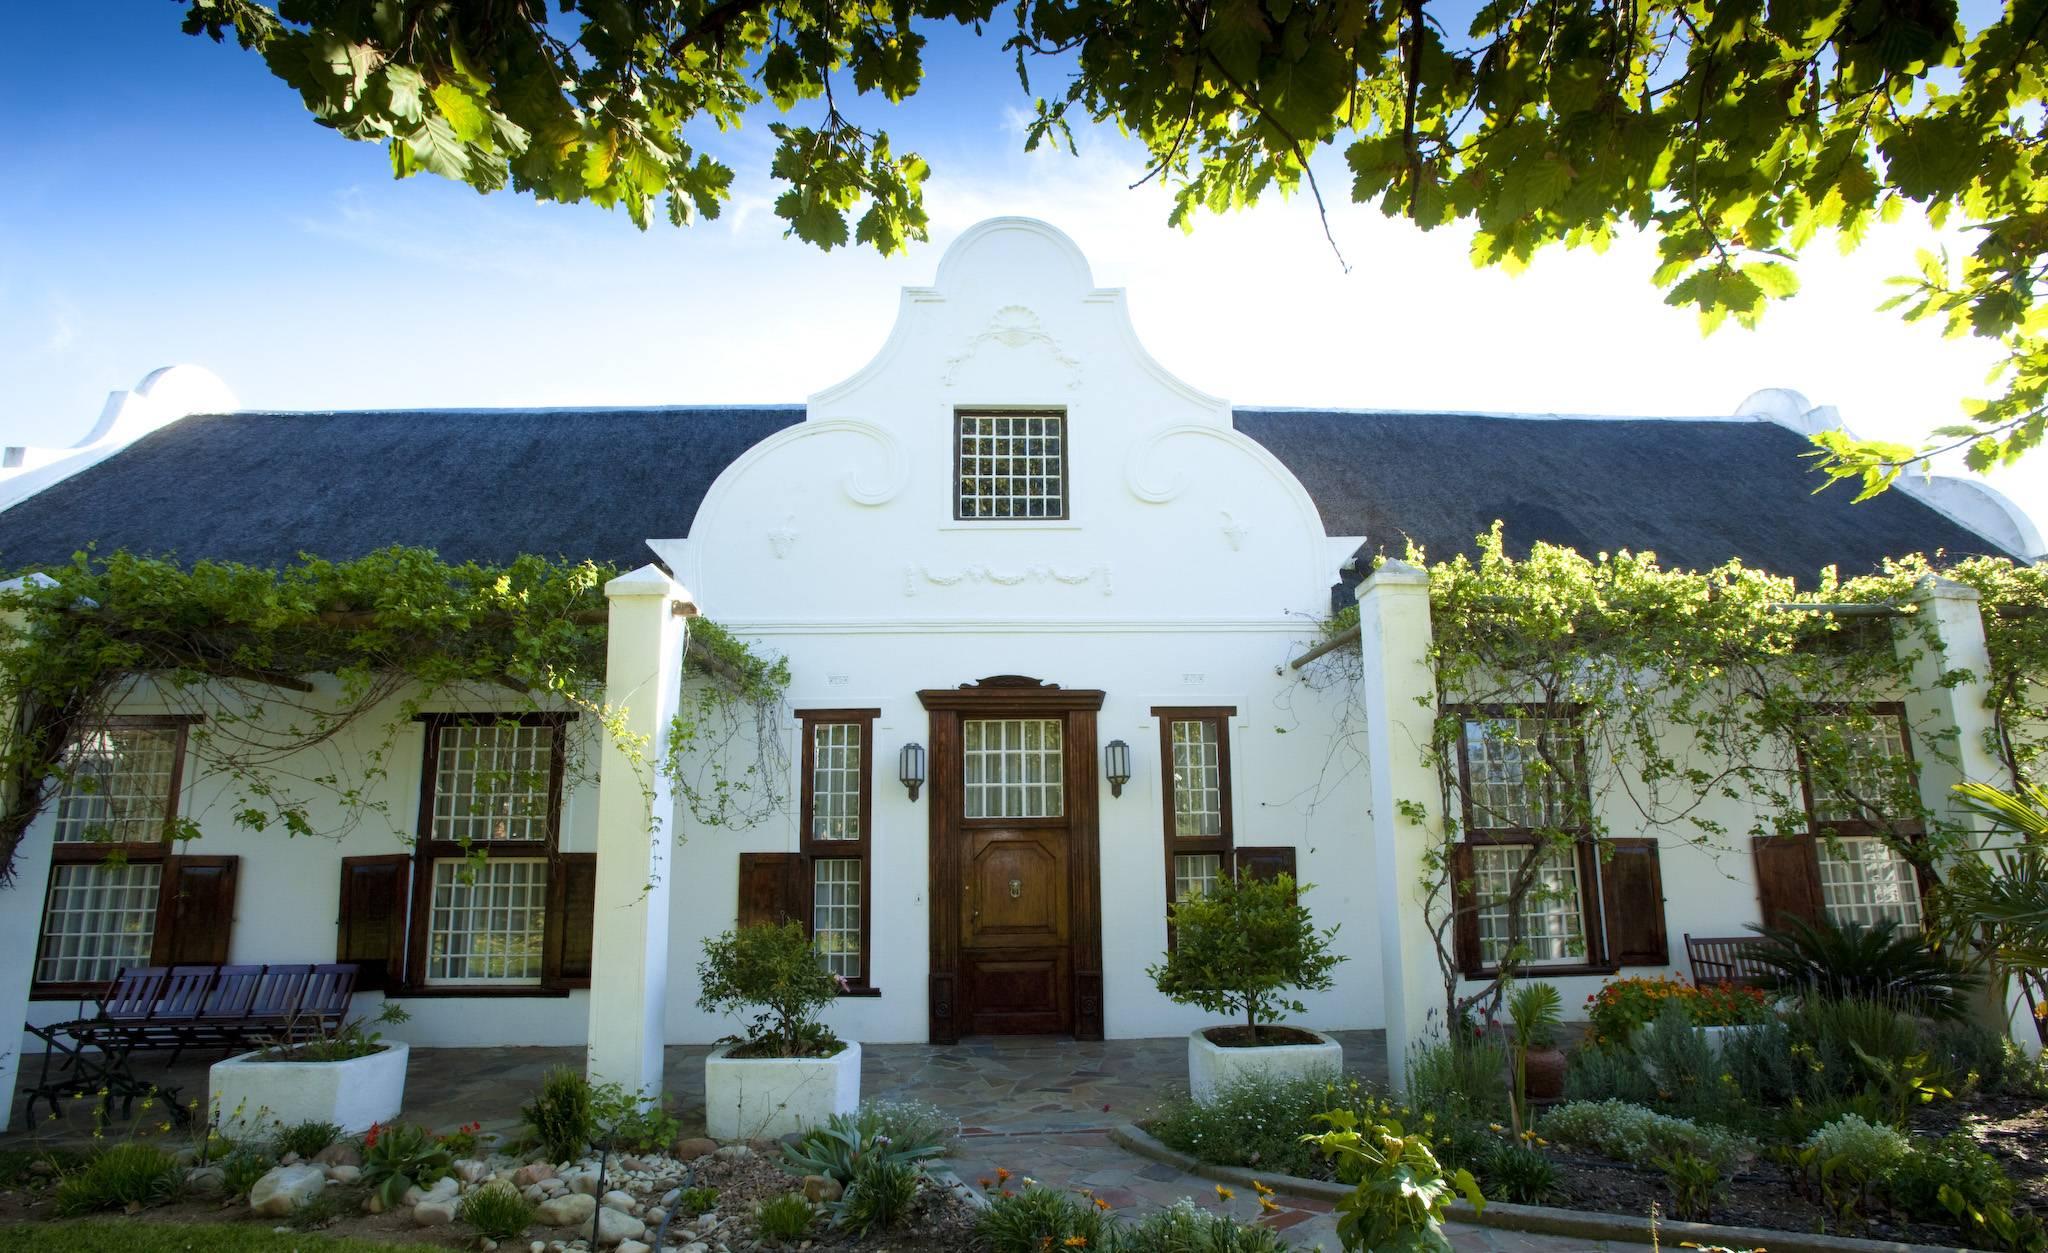 Cape Dutch Style Houses - House Plans | #47452